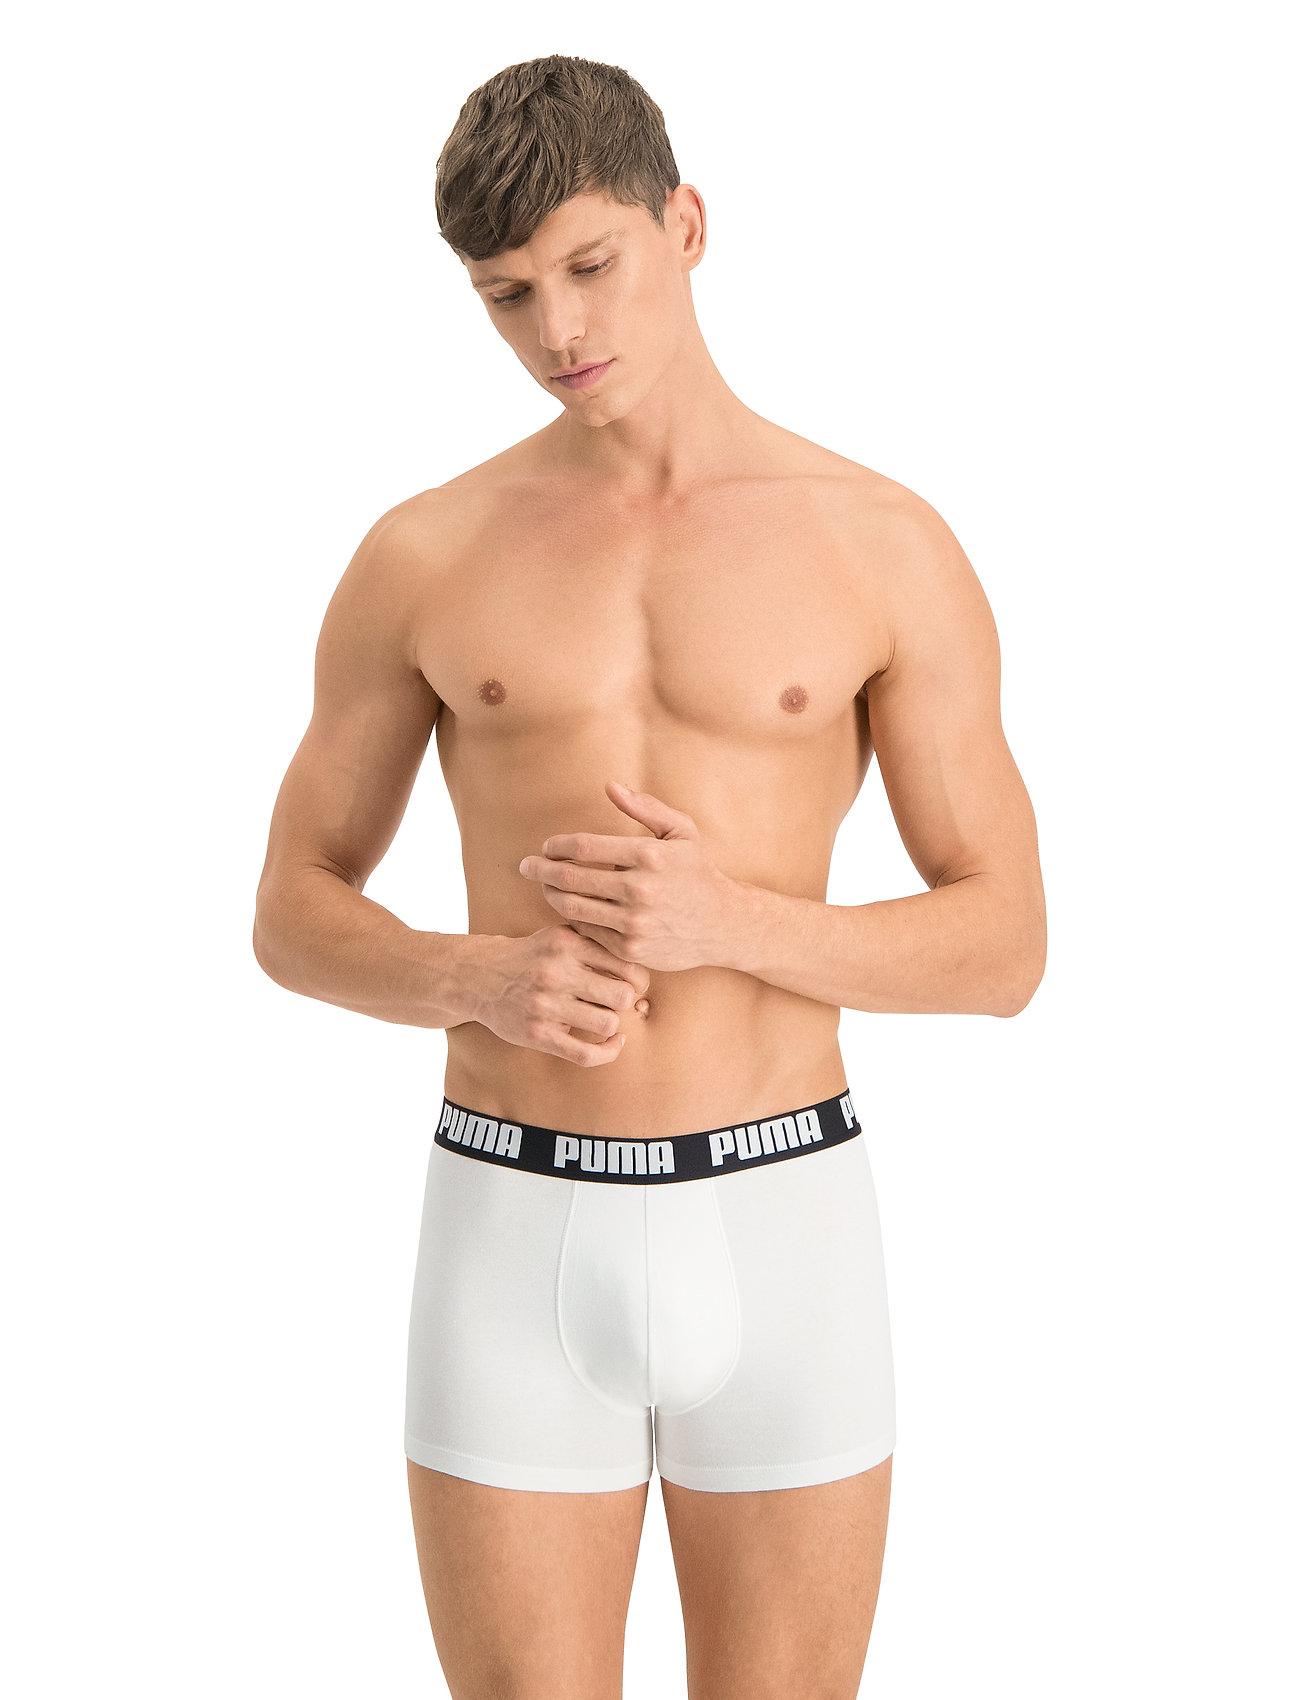 PUMA - PUMA BASIC BOXER 2P - boxer briefs - white / black - 0